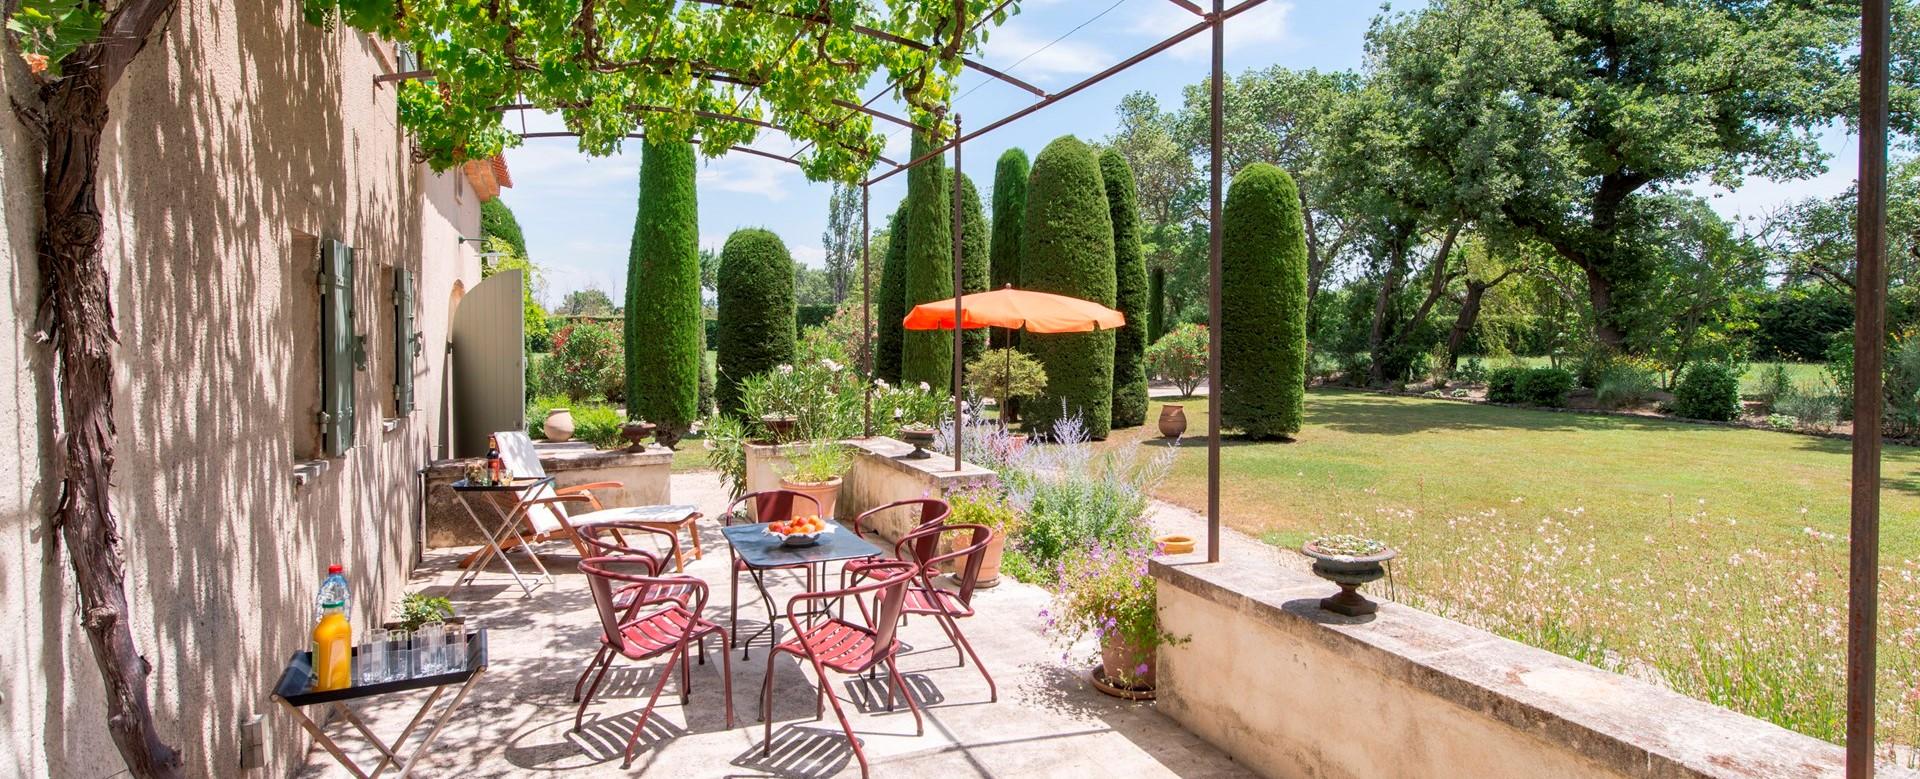 Villa-isabelle-sunny-garden-terrace